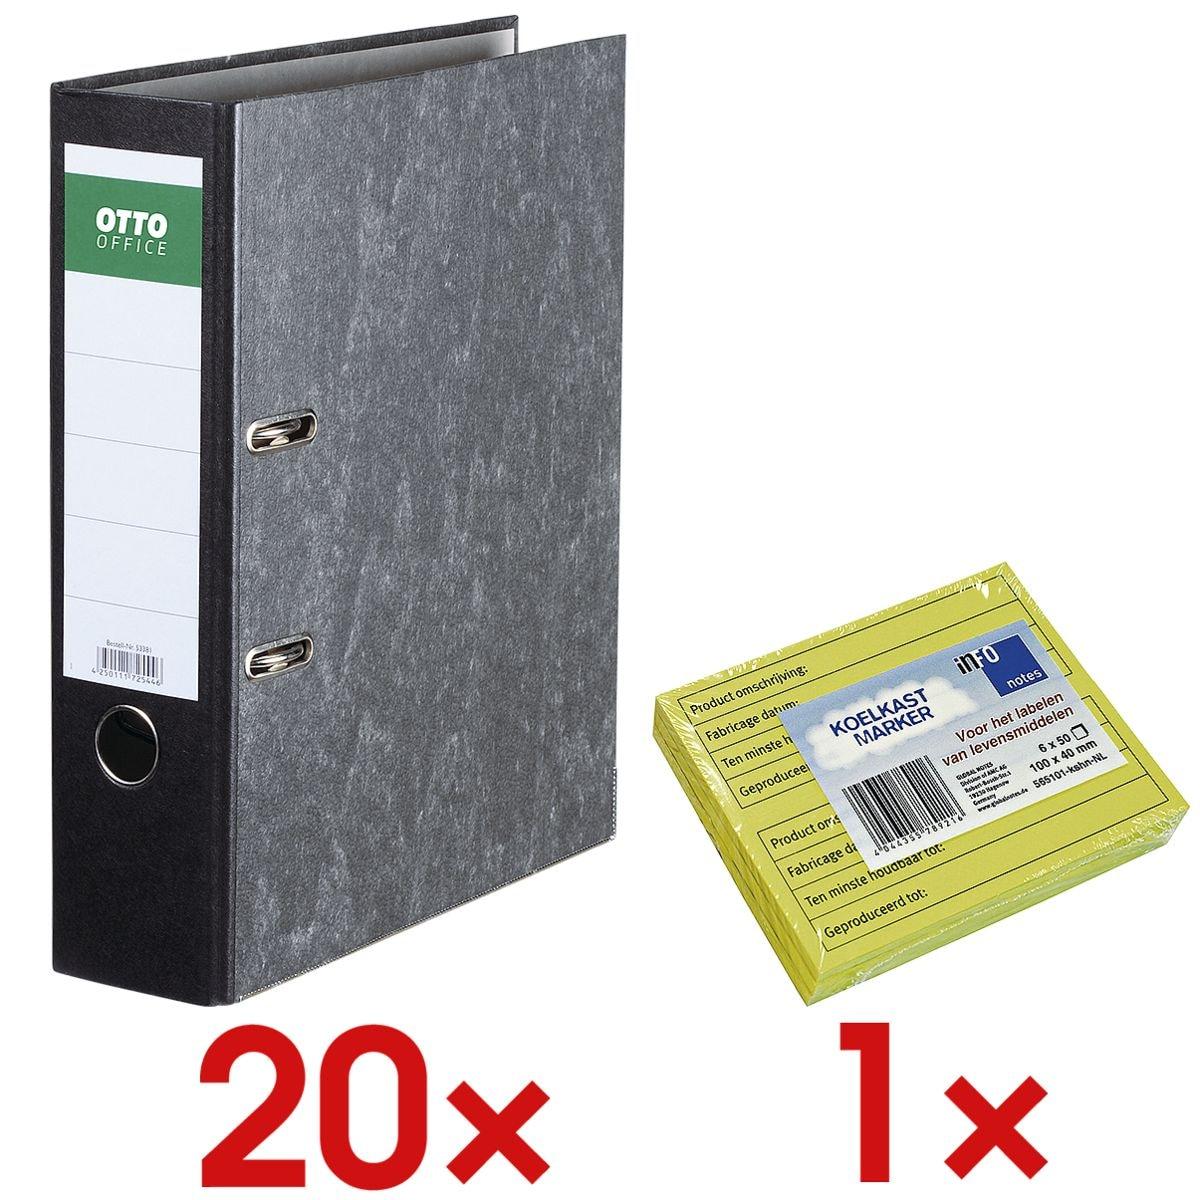 20x Ordner A4 OTTO Office Classic breed, wolkengemarmerd incl. Blok herkleefbare notes »Koelkast-Notes« met opdruk in Nederlands